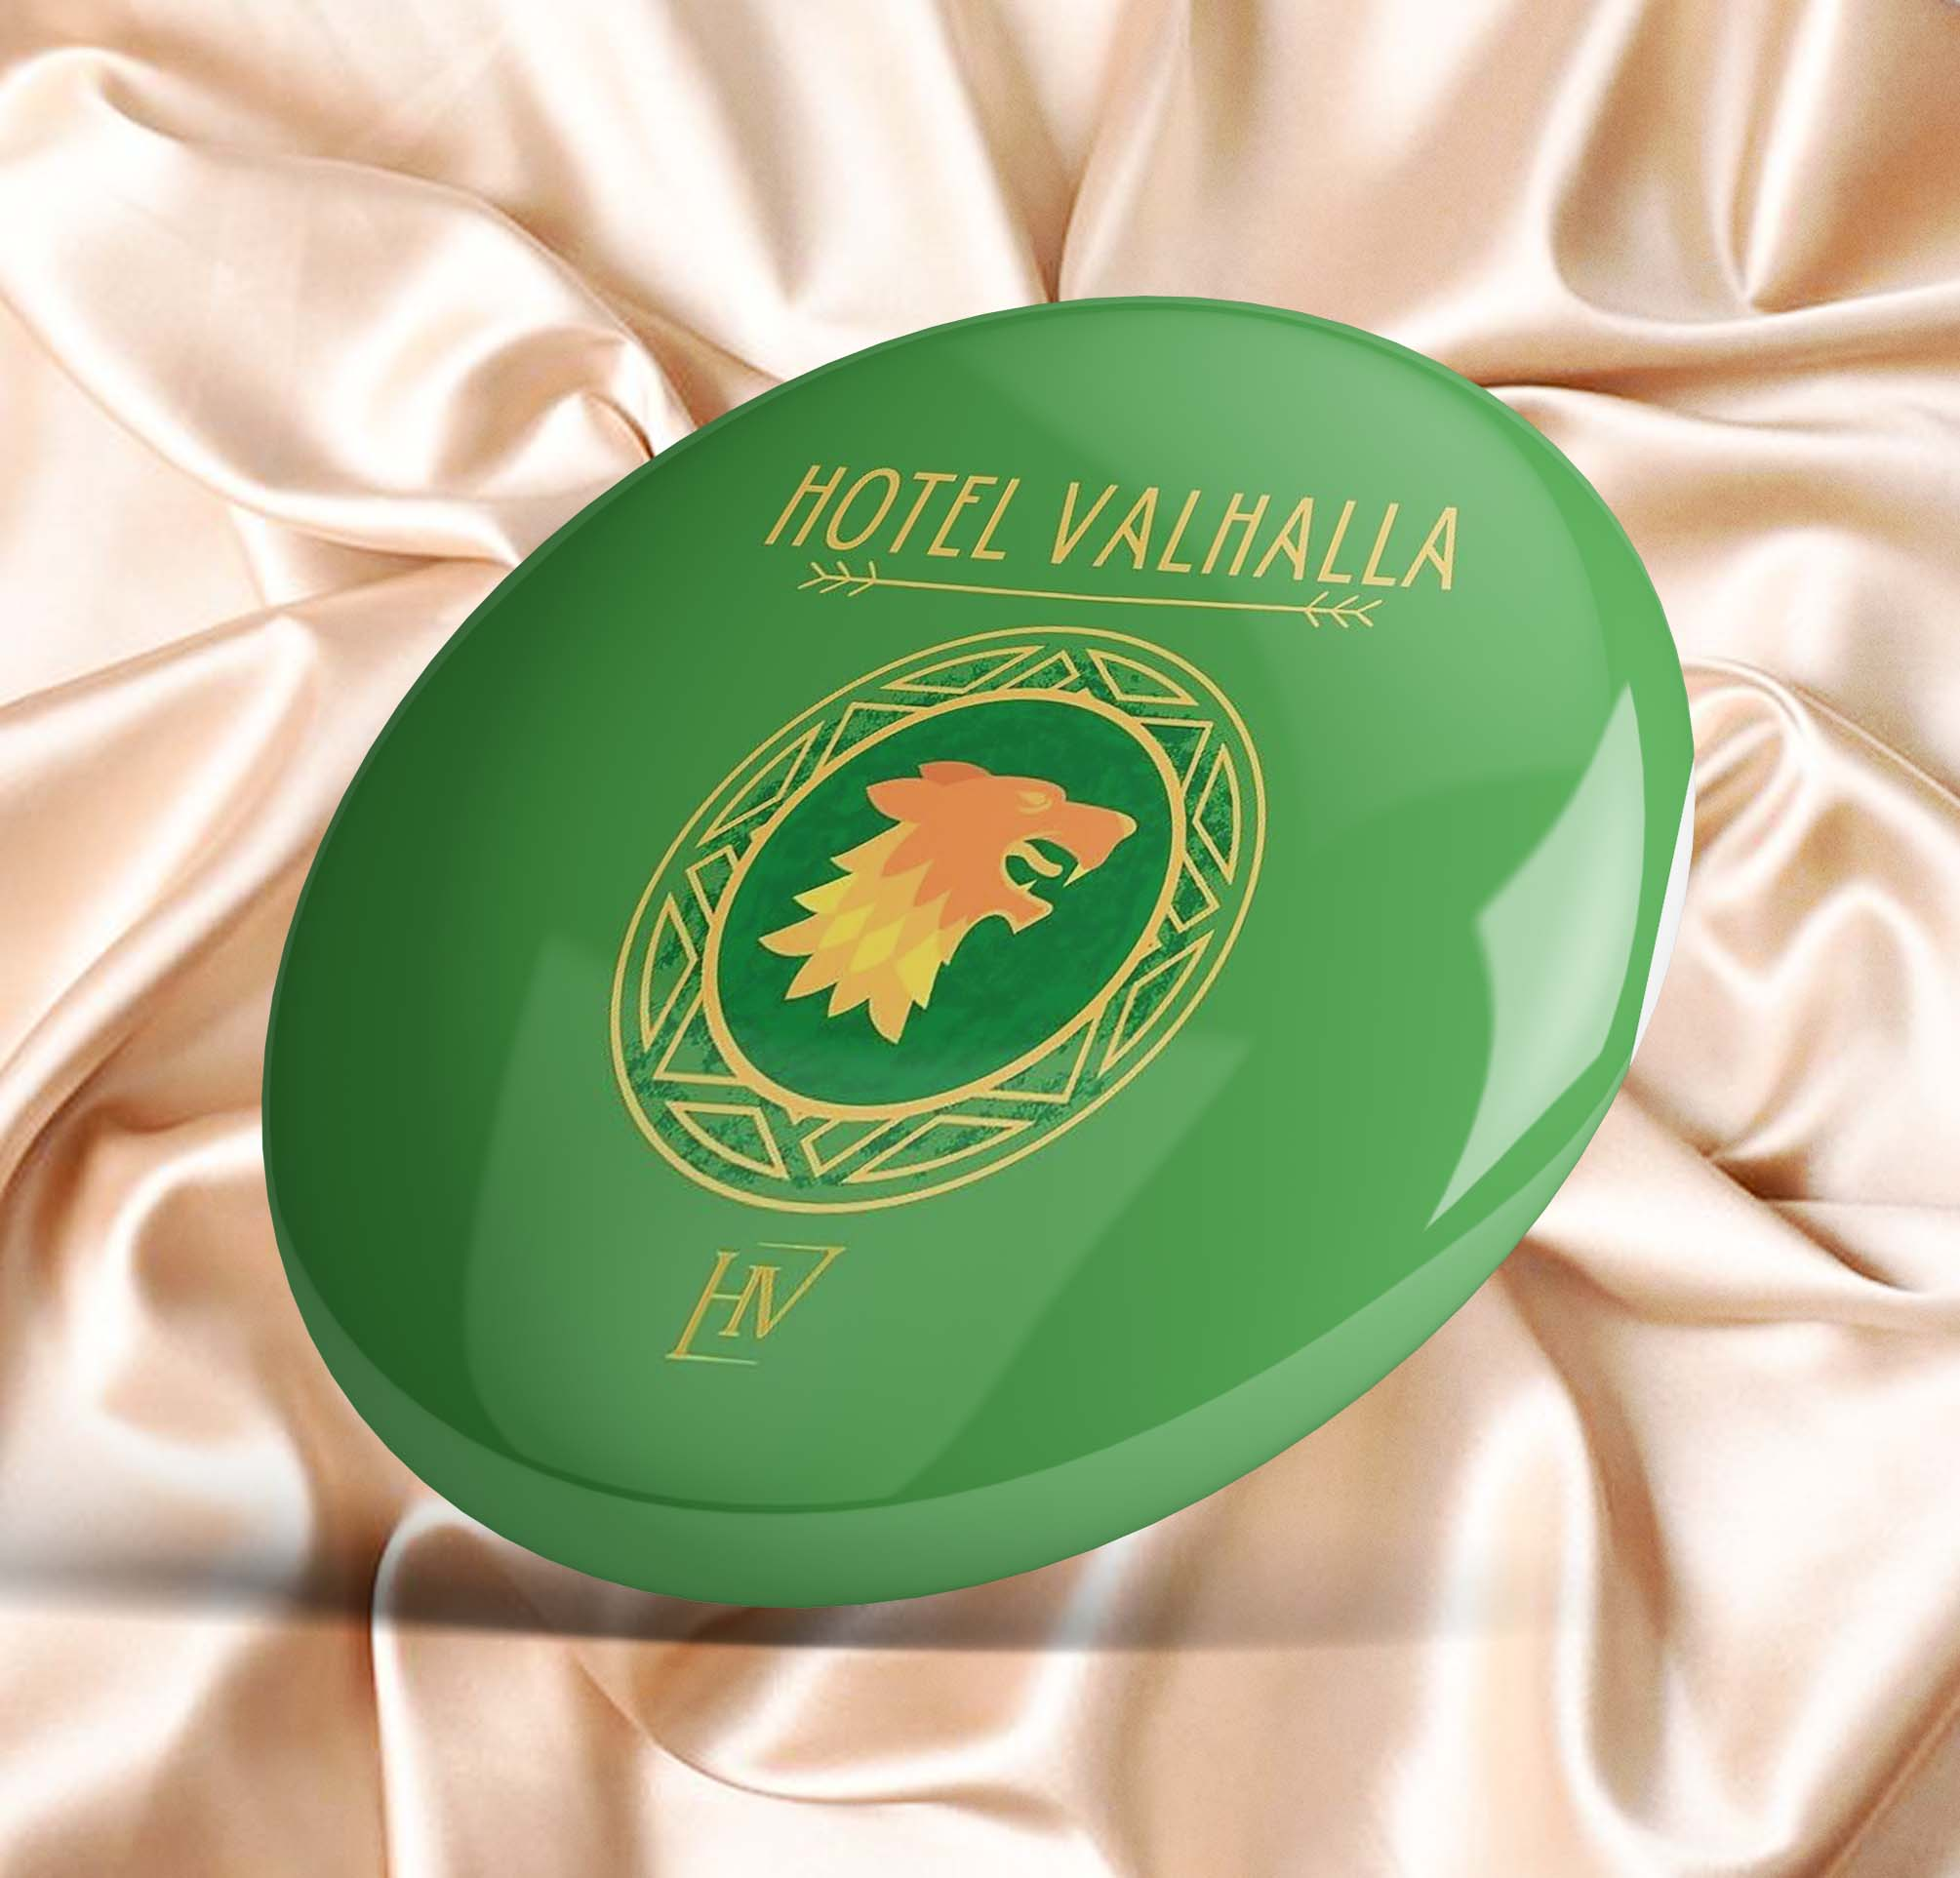 Hotel Valhalla Standard  Soft Enamel Pin Metal Collar Lapel Pin Cute Funny Fashion Badge Women Hat G